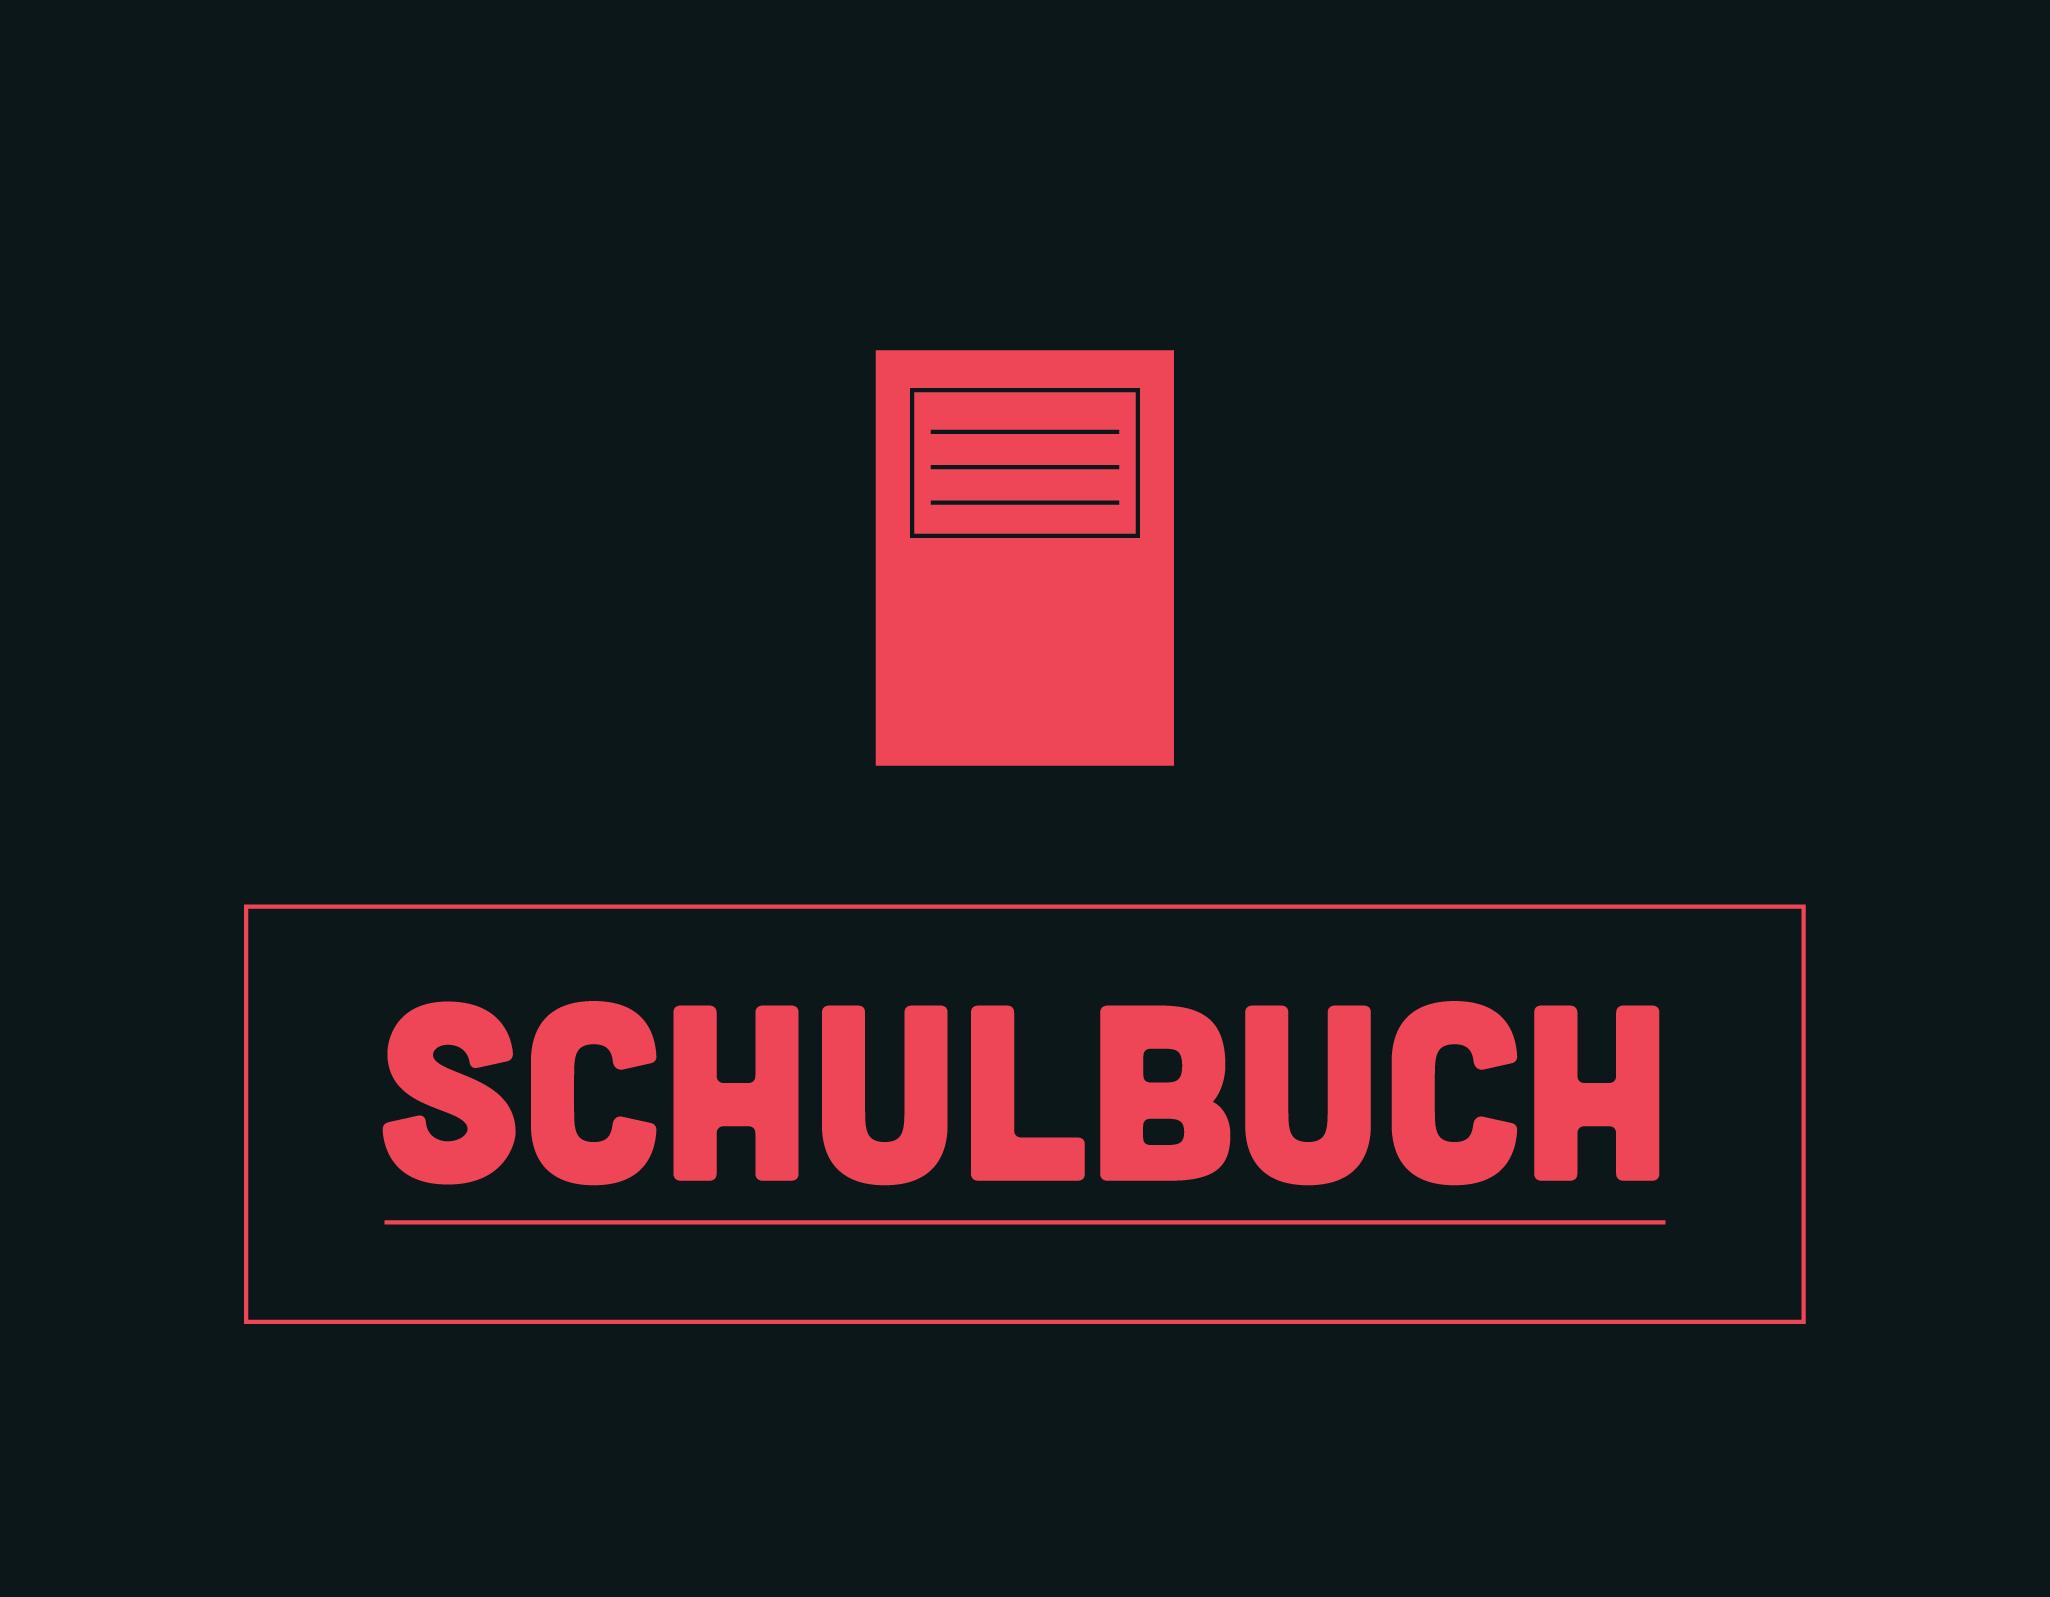 Schulbuch-03